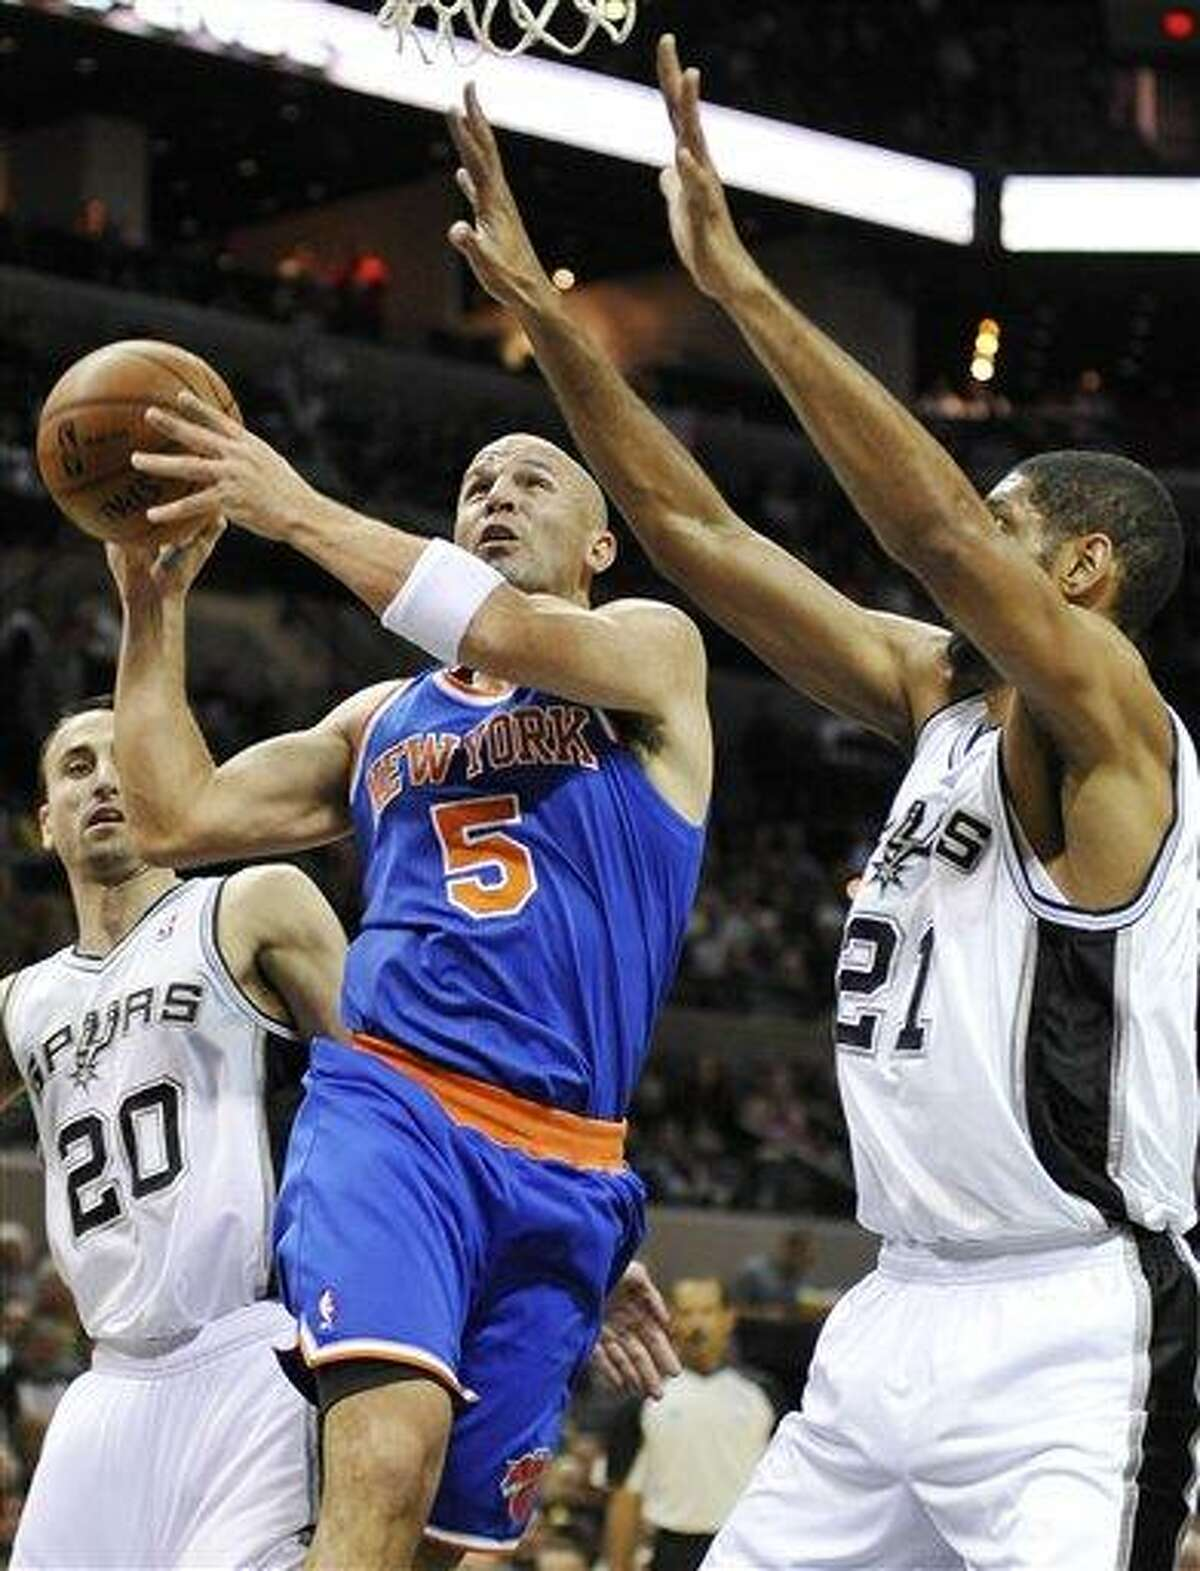 New York Knicks' Jason Kidd (5) shoots over San Antonio Spurs' Tim Duncan, right, during the first half of an NBA basketball game on Thursday, Nov. 15, 2012, in San Antonio. (AP Photo/Darren Abate)